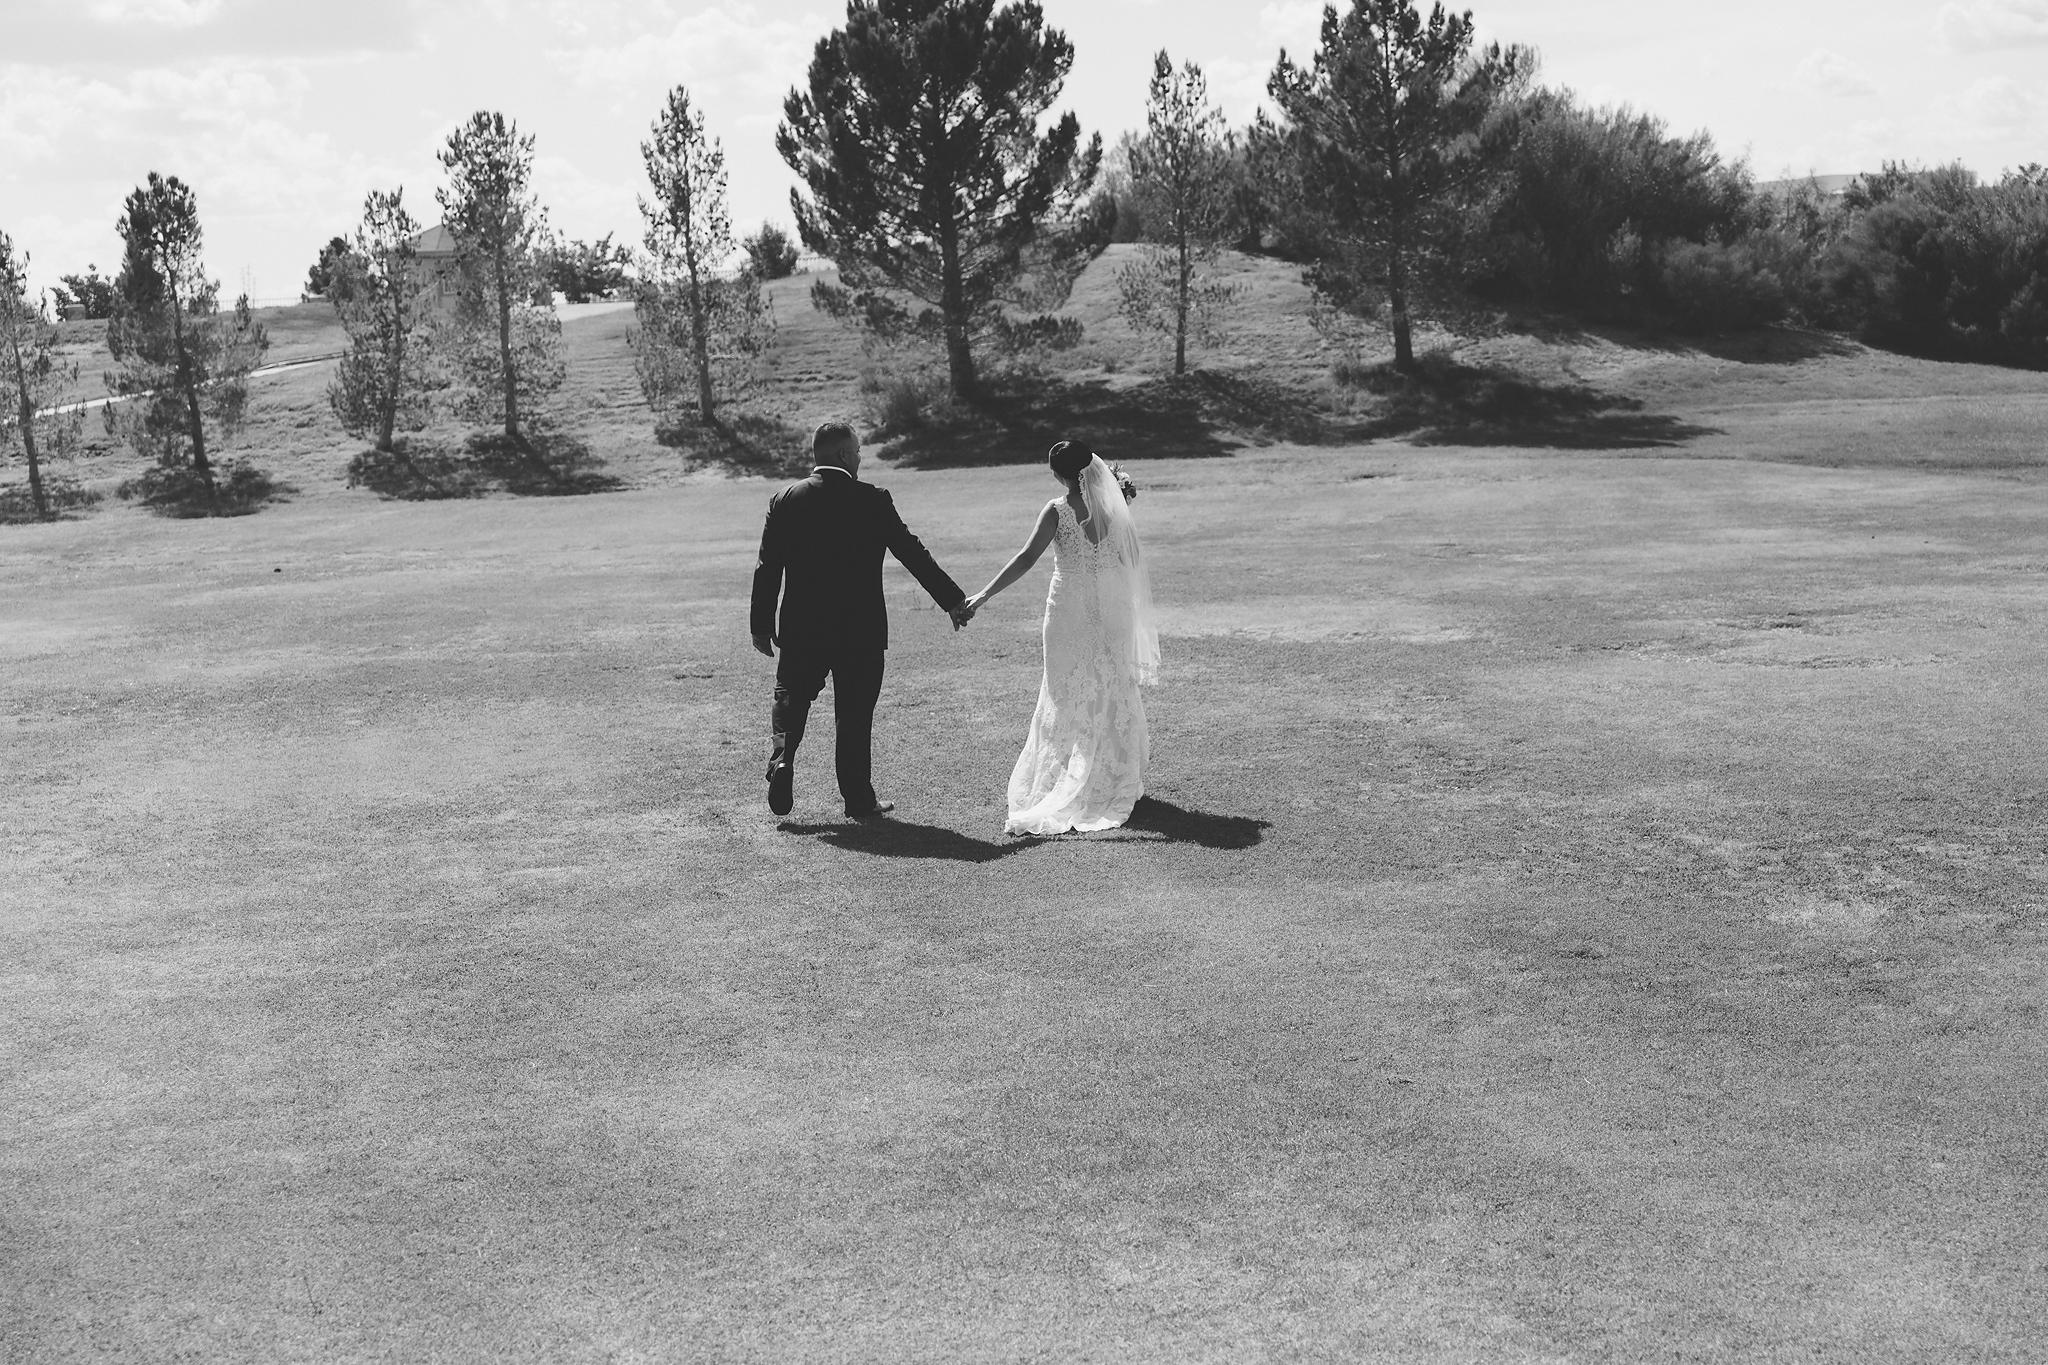 sonoma-ranch-wedding_14.jpg